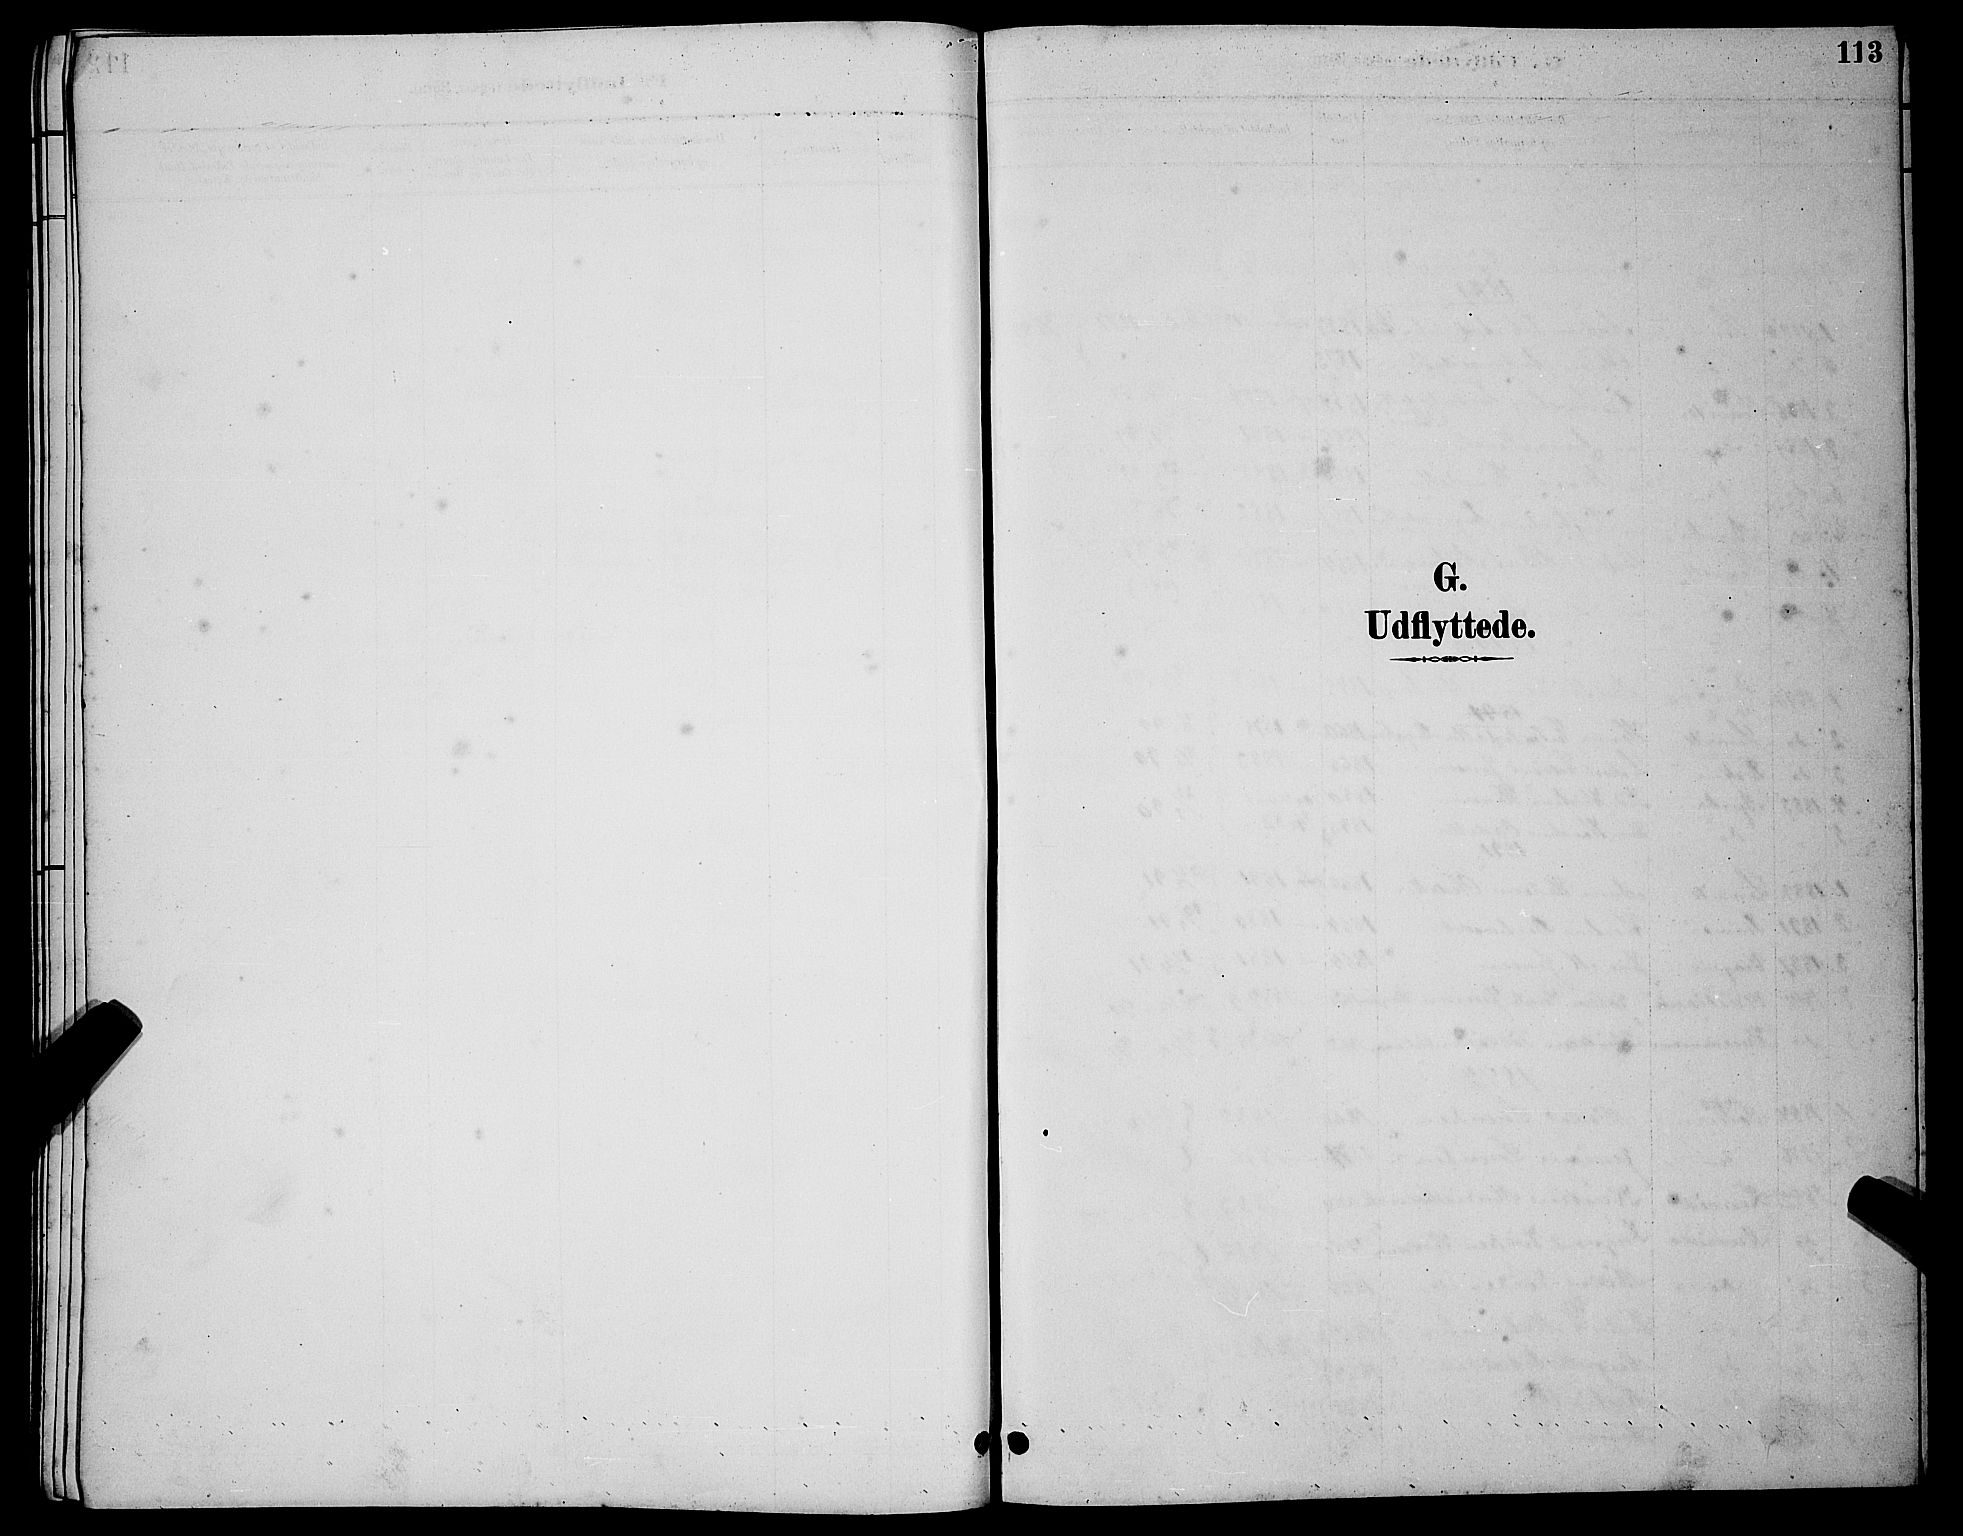 SATØ, Tranøy sokneprestkontor, I/Ia/Iab/L0004klokker: Klokkerbok nr. 4, 1888-1901, s. 113